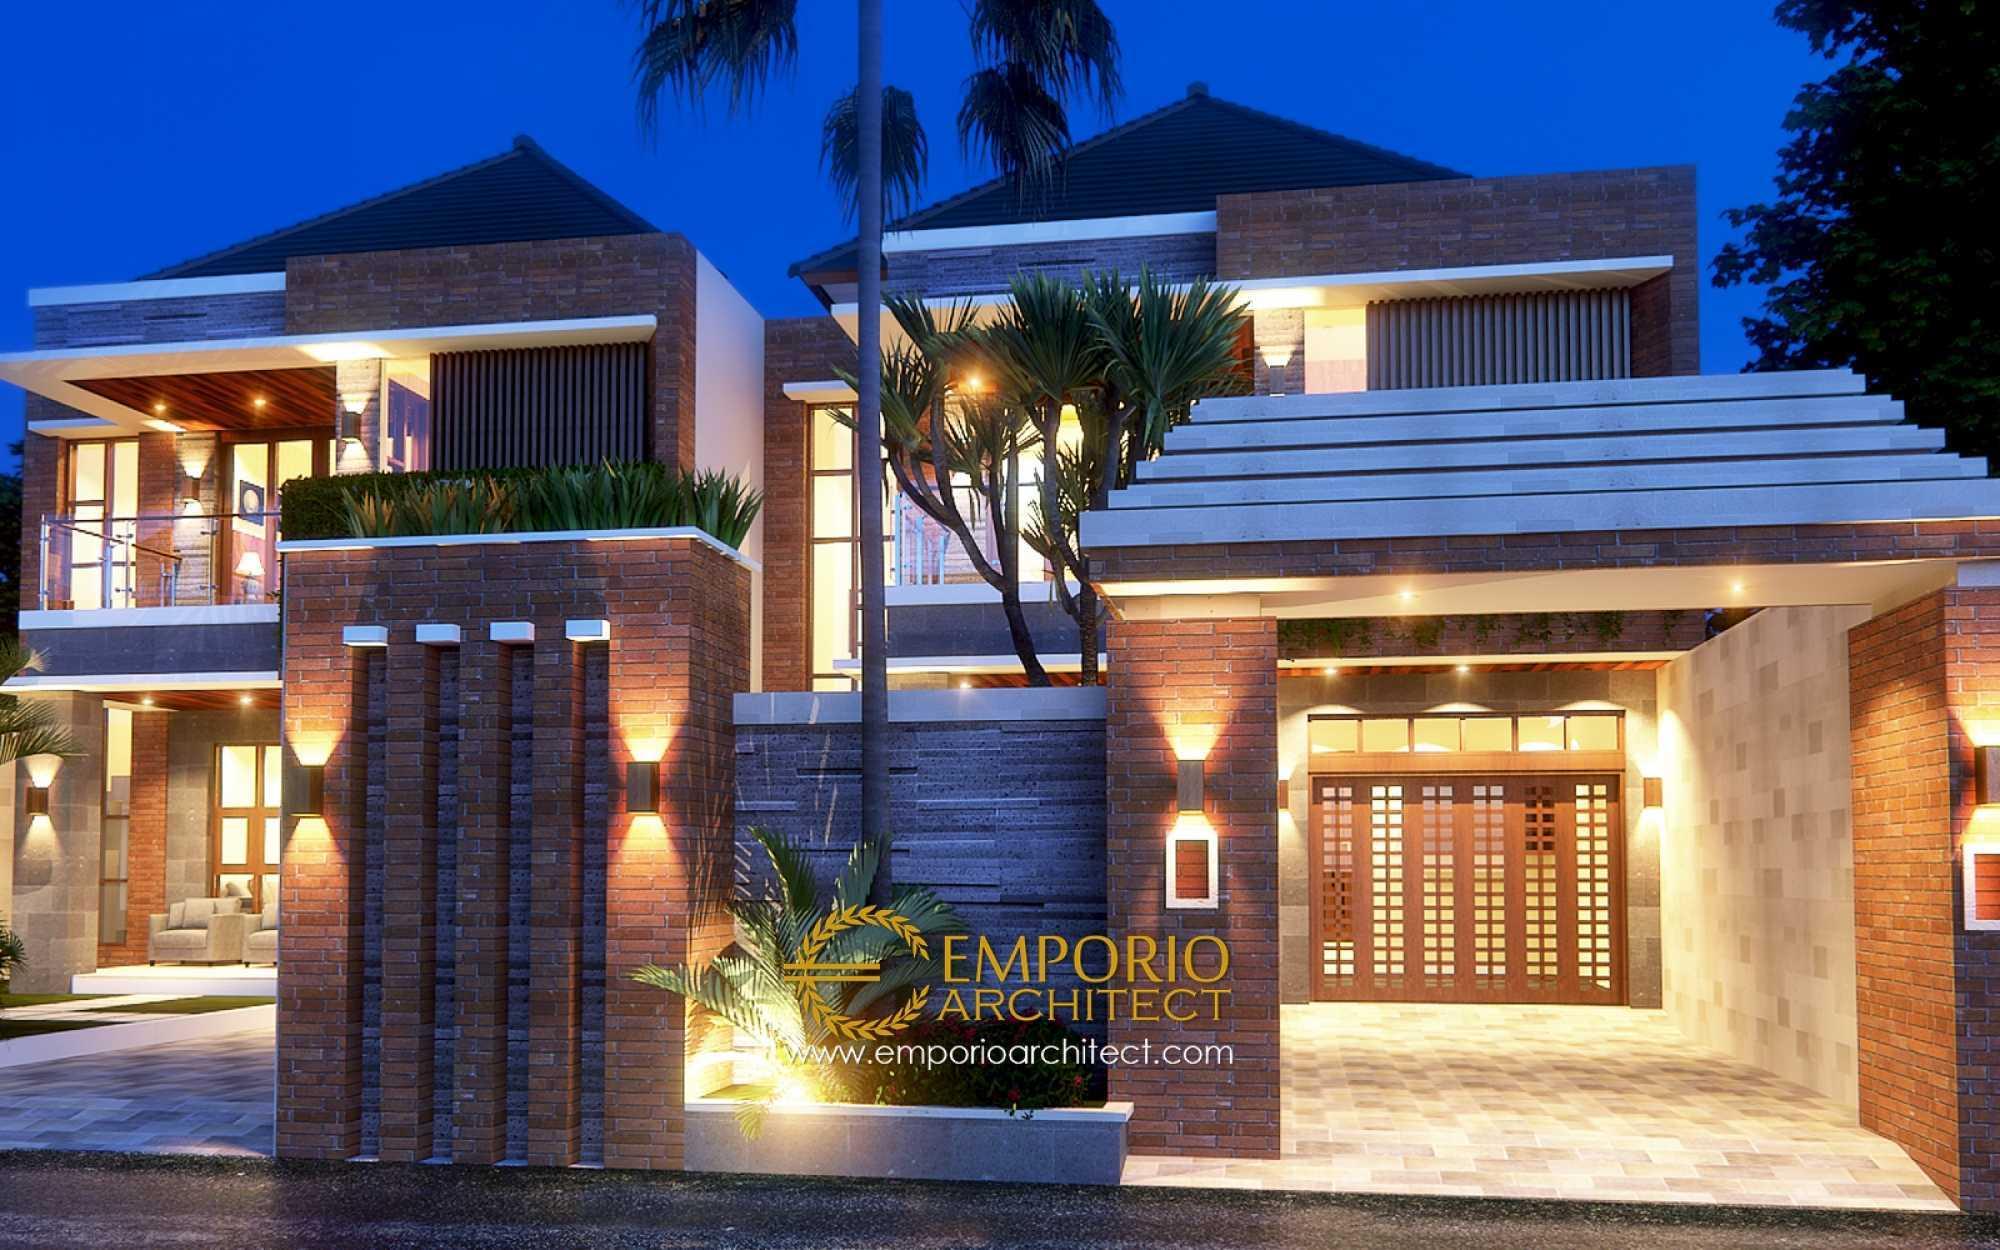 Emporio Architect Desain Rumah Villa Bali Tropis 375 @ Denpasar, Bali Kota Denpasar, Bali, Indonesia Kota Denpasar, Bali, Indonesia Emporio-Architect-Desain-Rumah-Villa-Bali-Tropis-375-Denpasar-Bali  76211